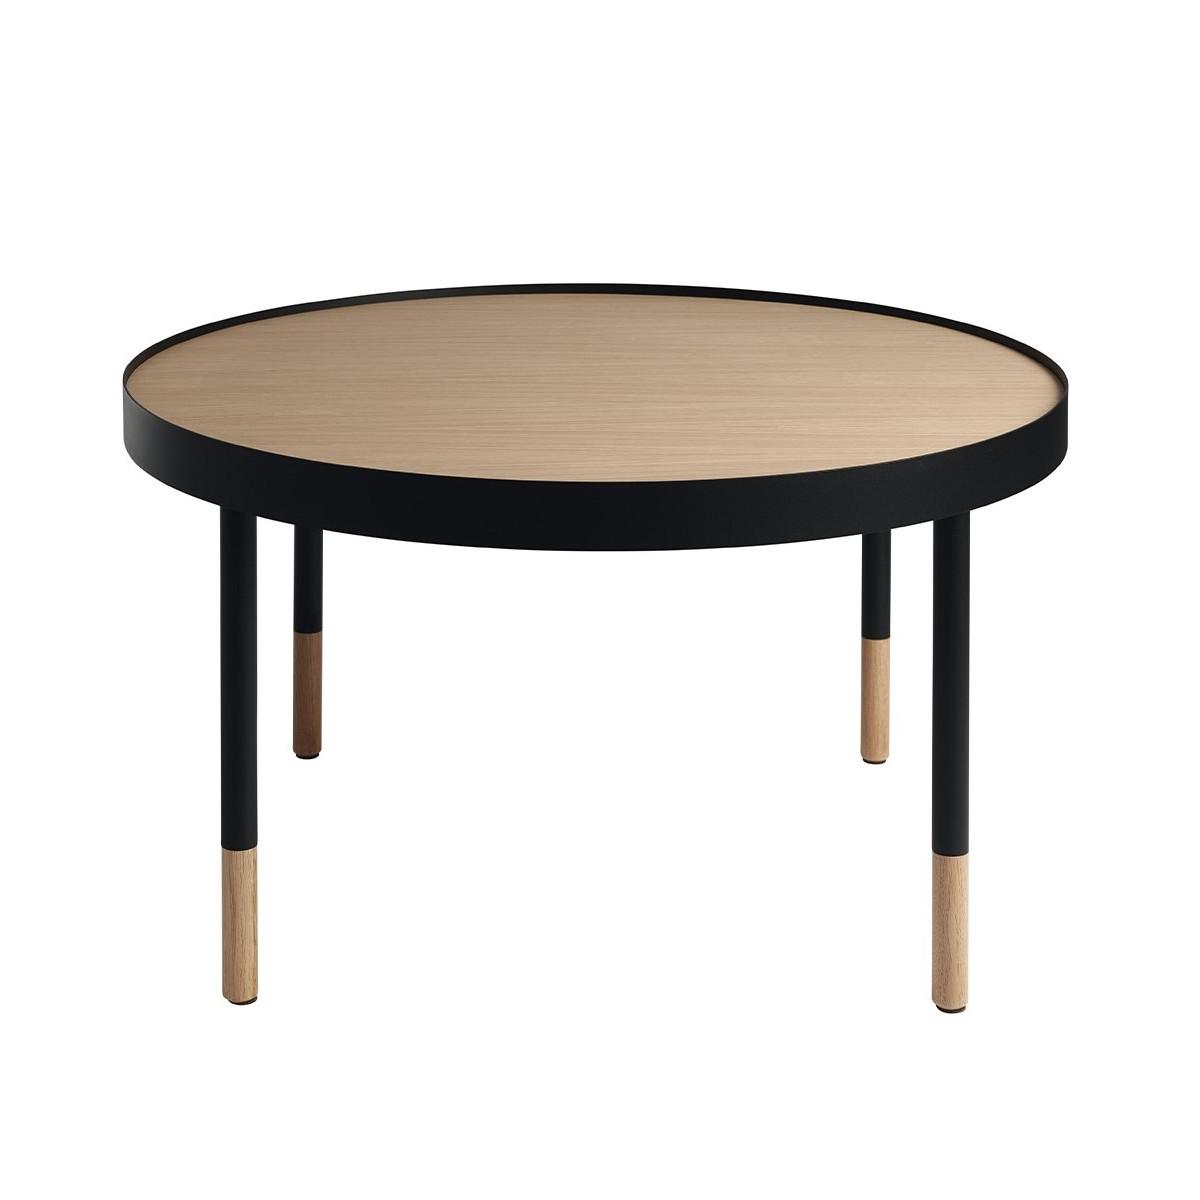 Edmond Coffee Table - Résistub Productions